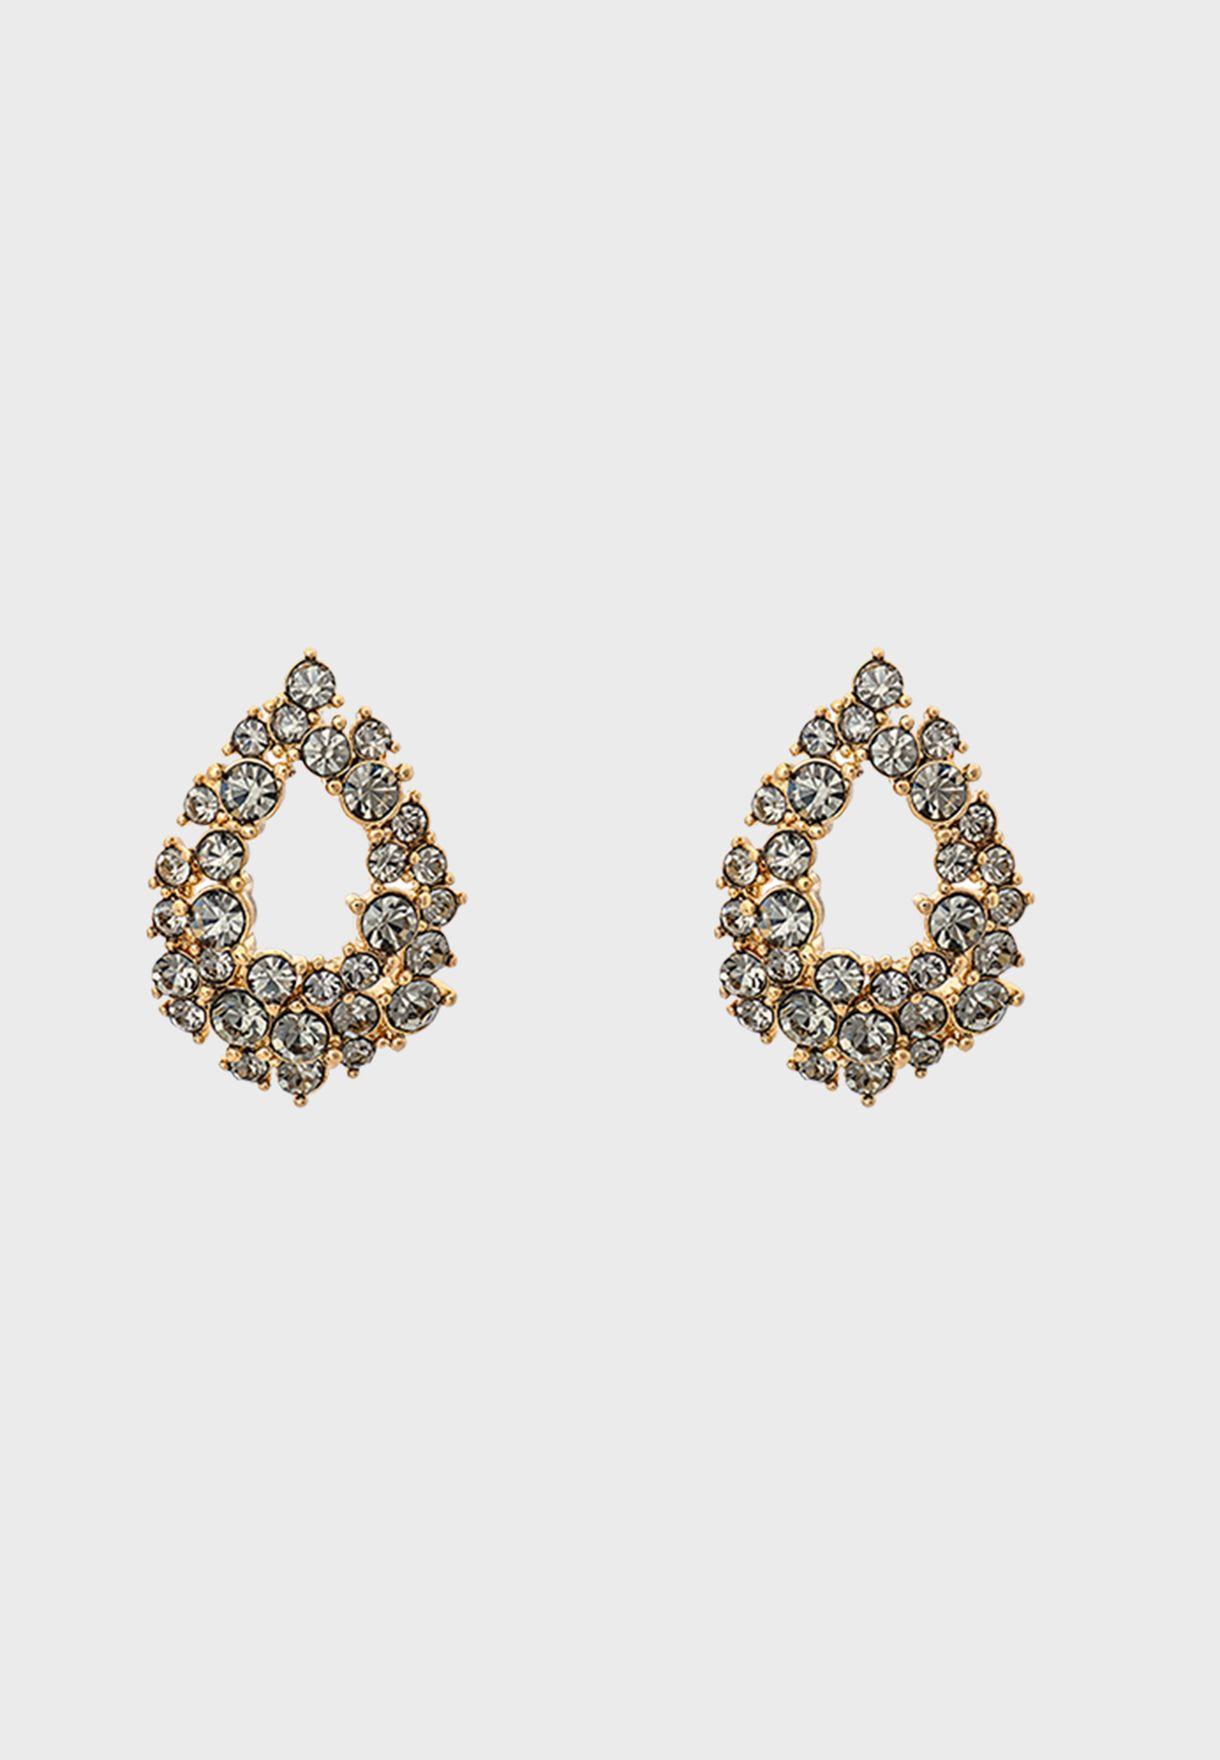 Petite Alice Embellished earrings